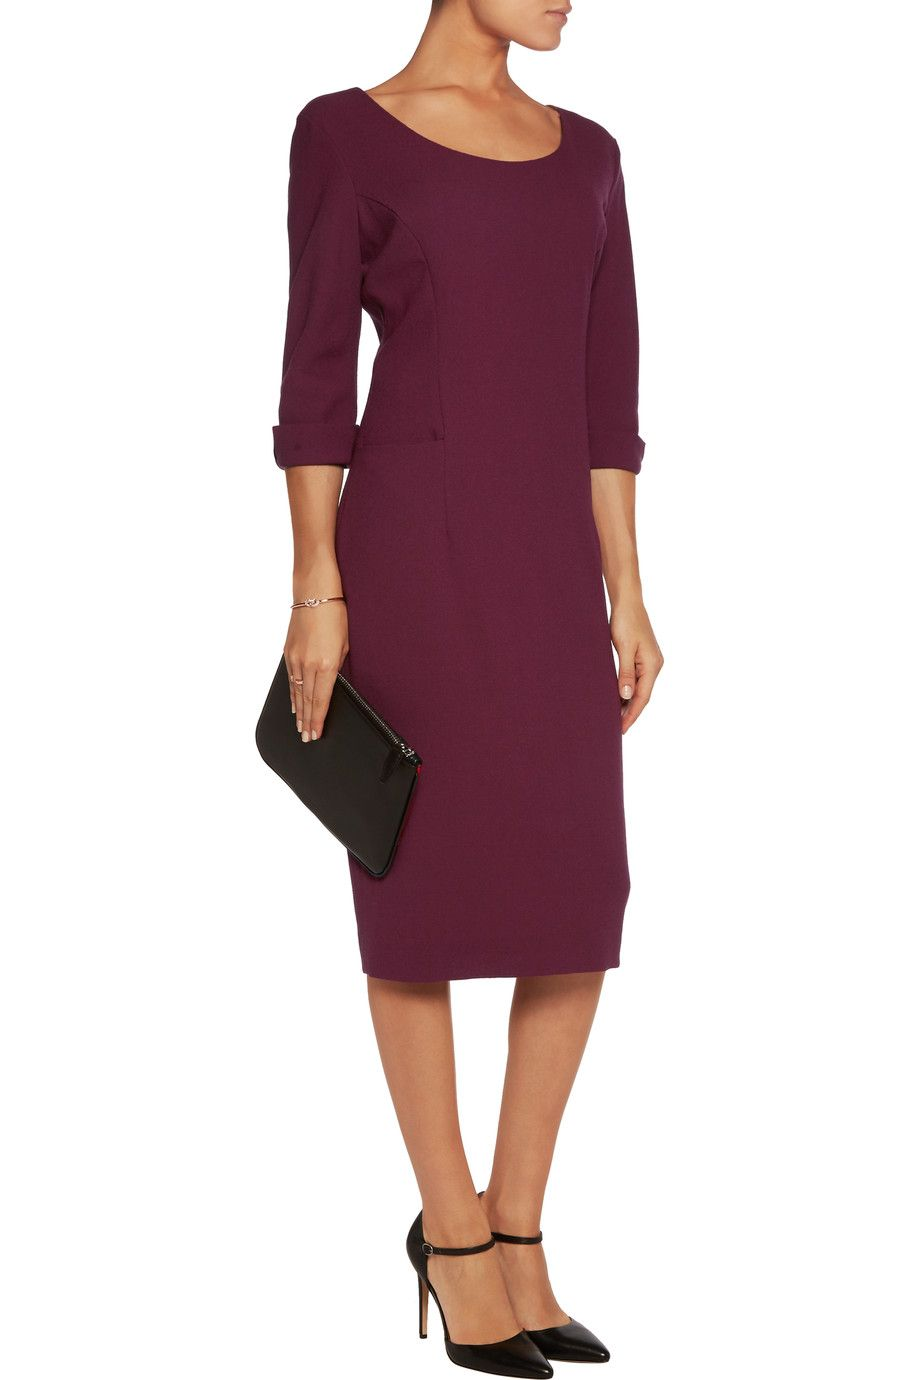 Nikita wool-crepe midi dress   GOAT   Sale up to 70% off